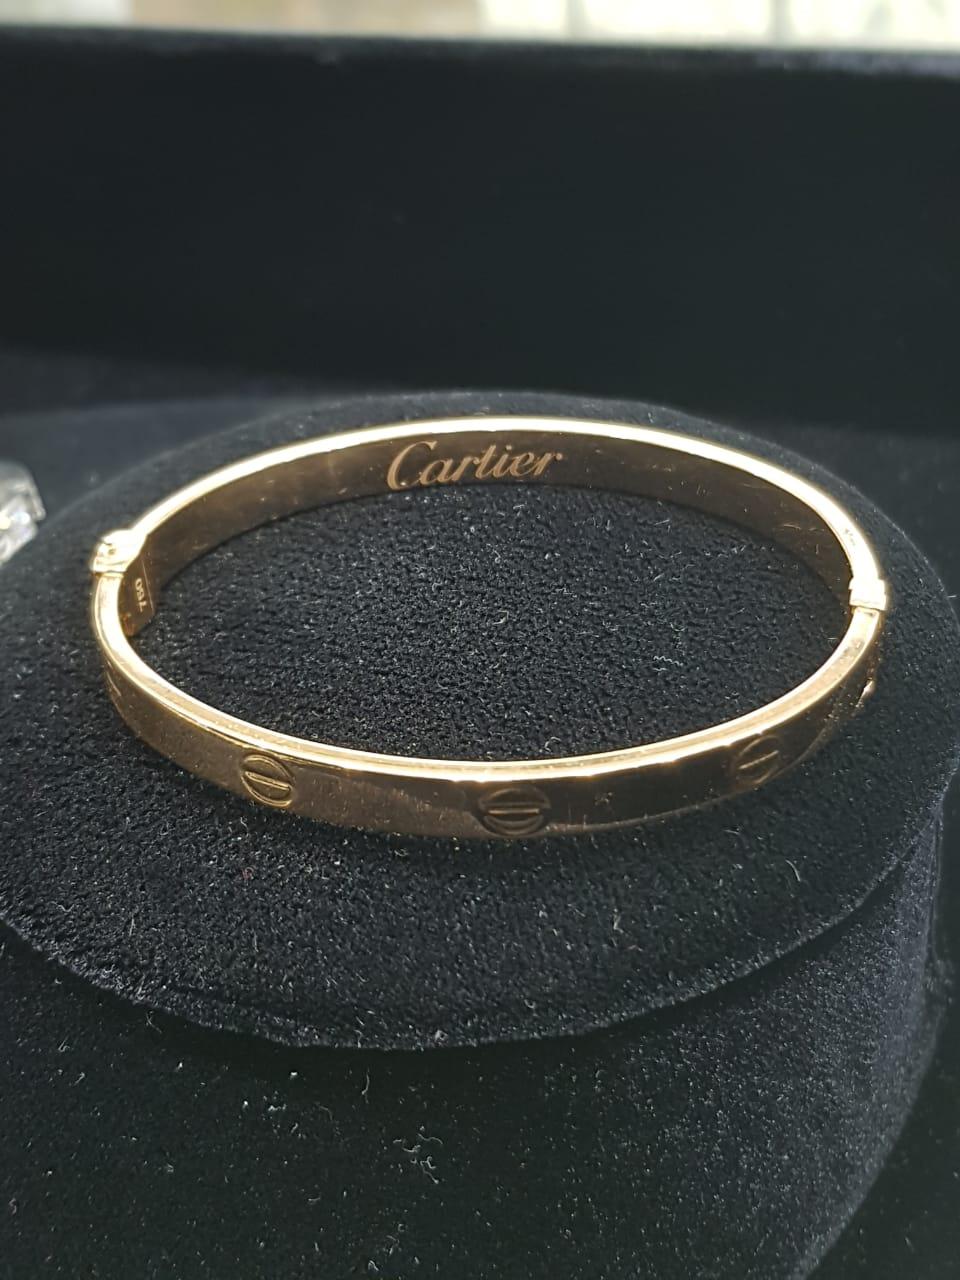 بالصور: مجوهرات بالرياض مقلدة لماركة f87aedac-ae9a-4810-a